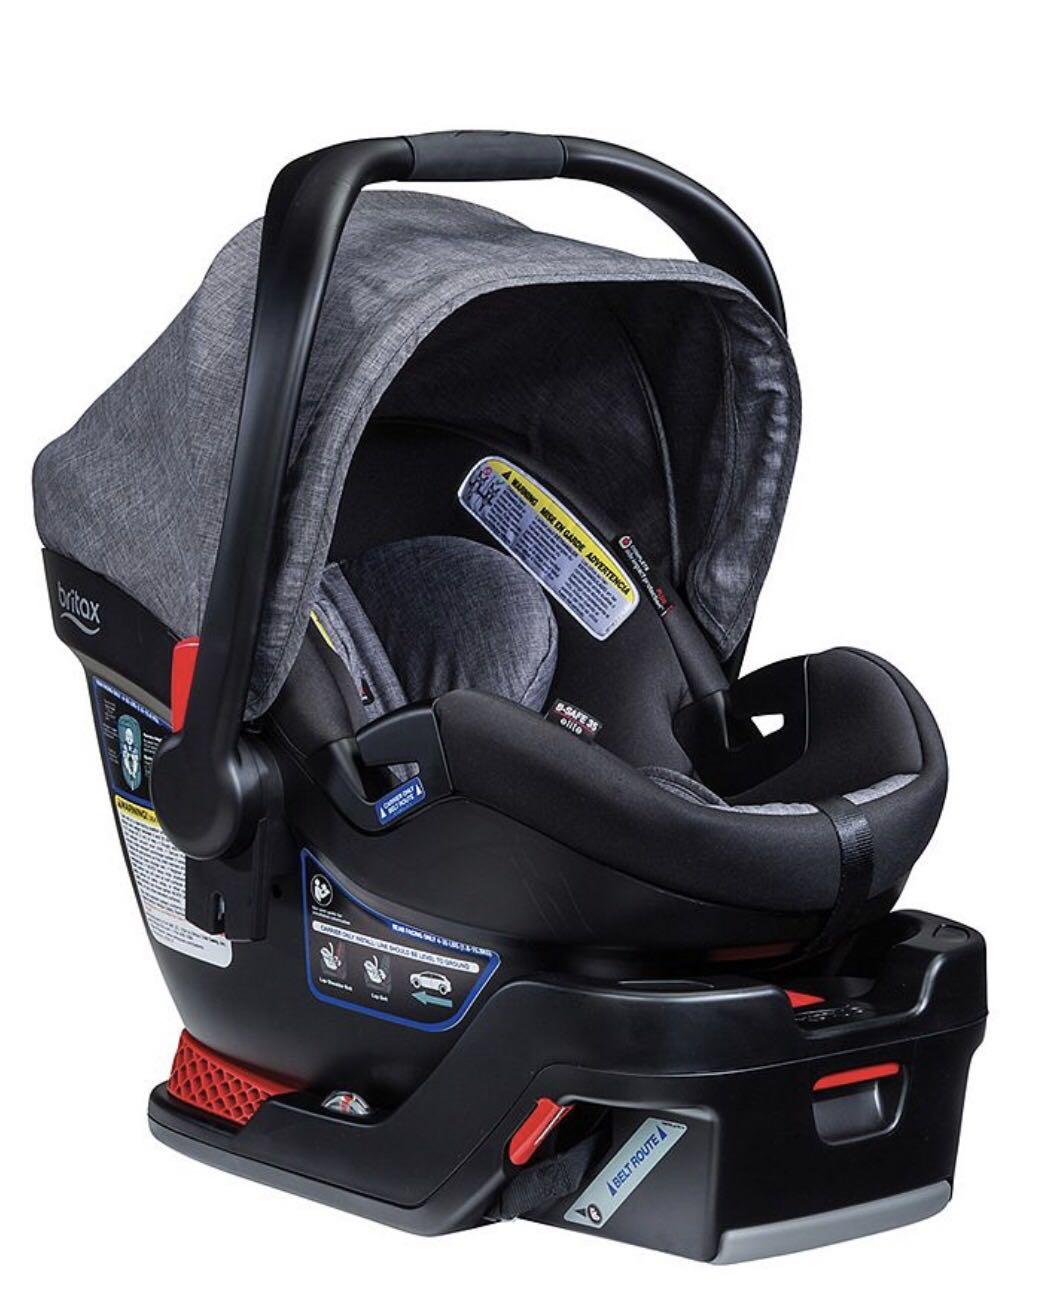 Britax B-Safe 35 Infant Car Seat, 3 car seat bases and Contours stroller adaptors